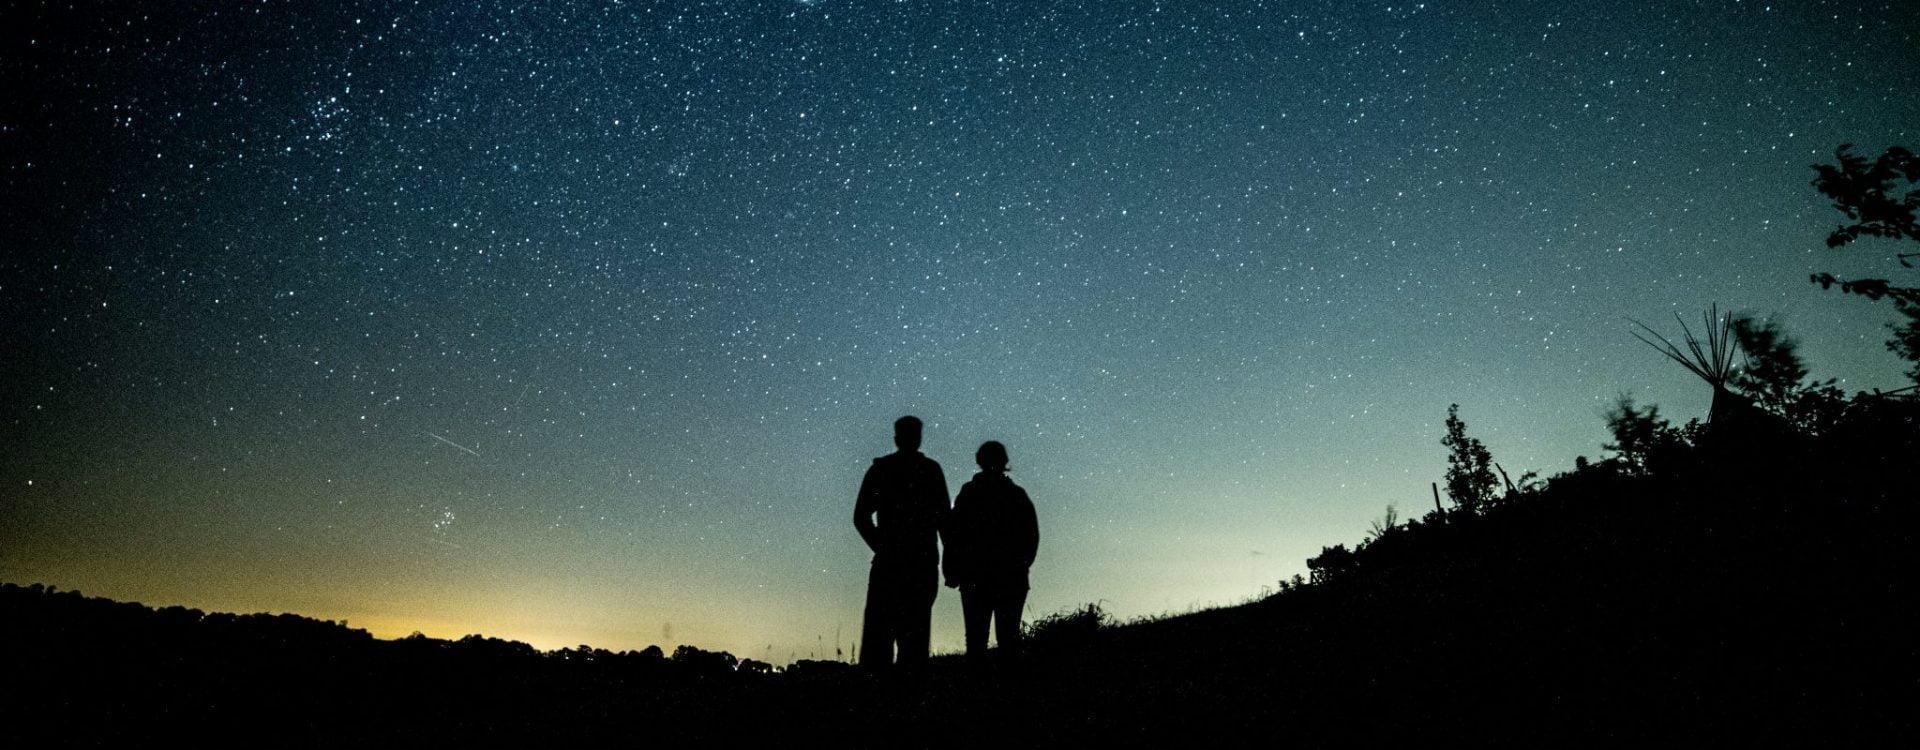 stargazing over the Brecon Beacons